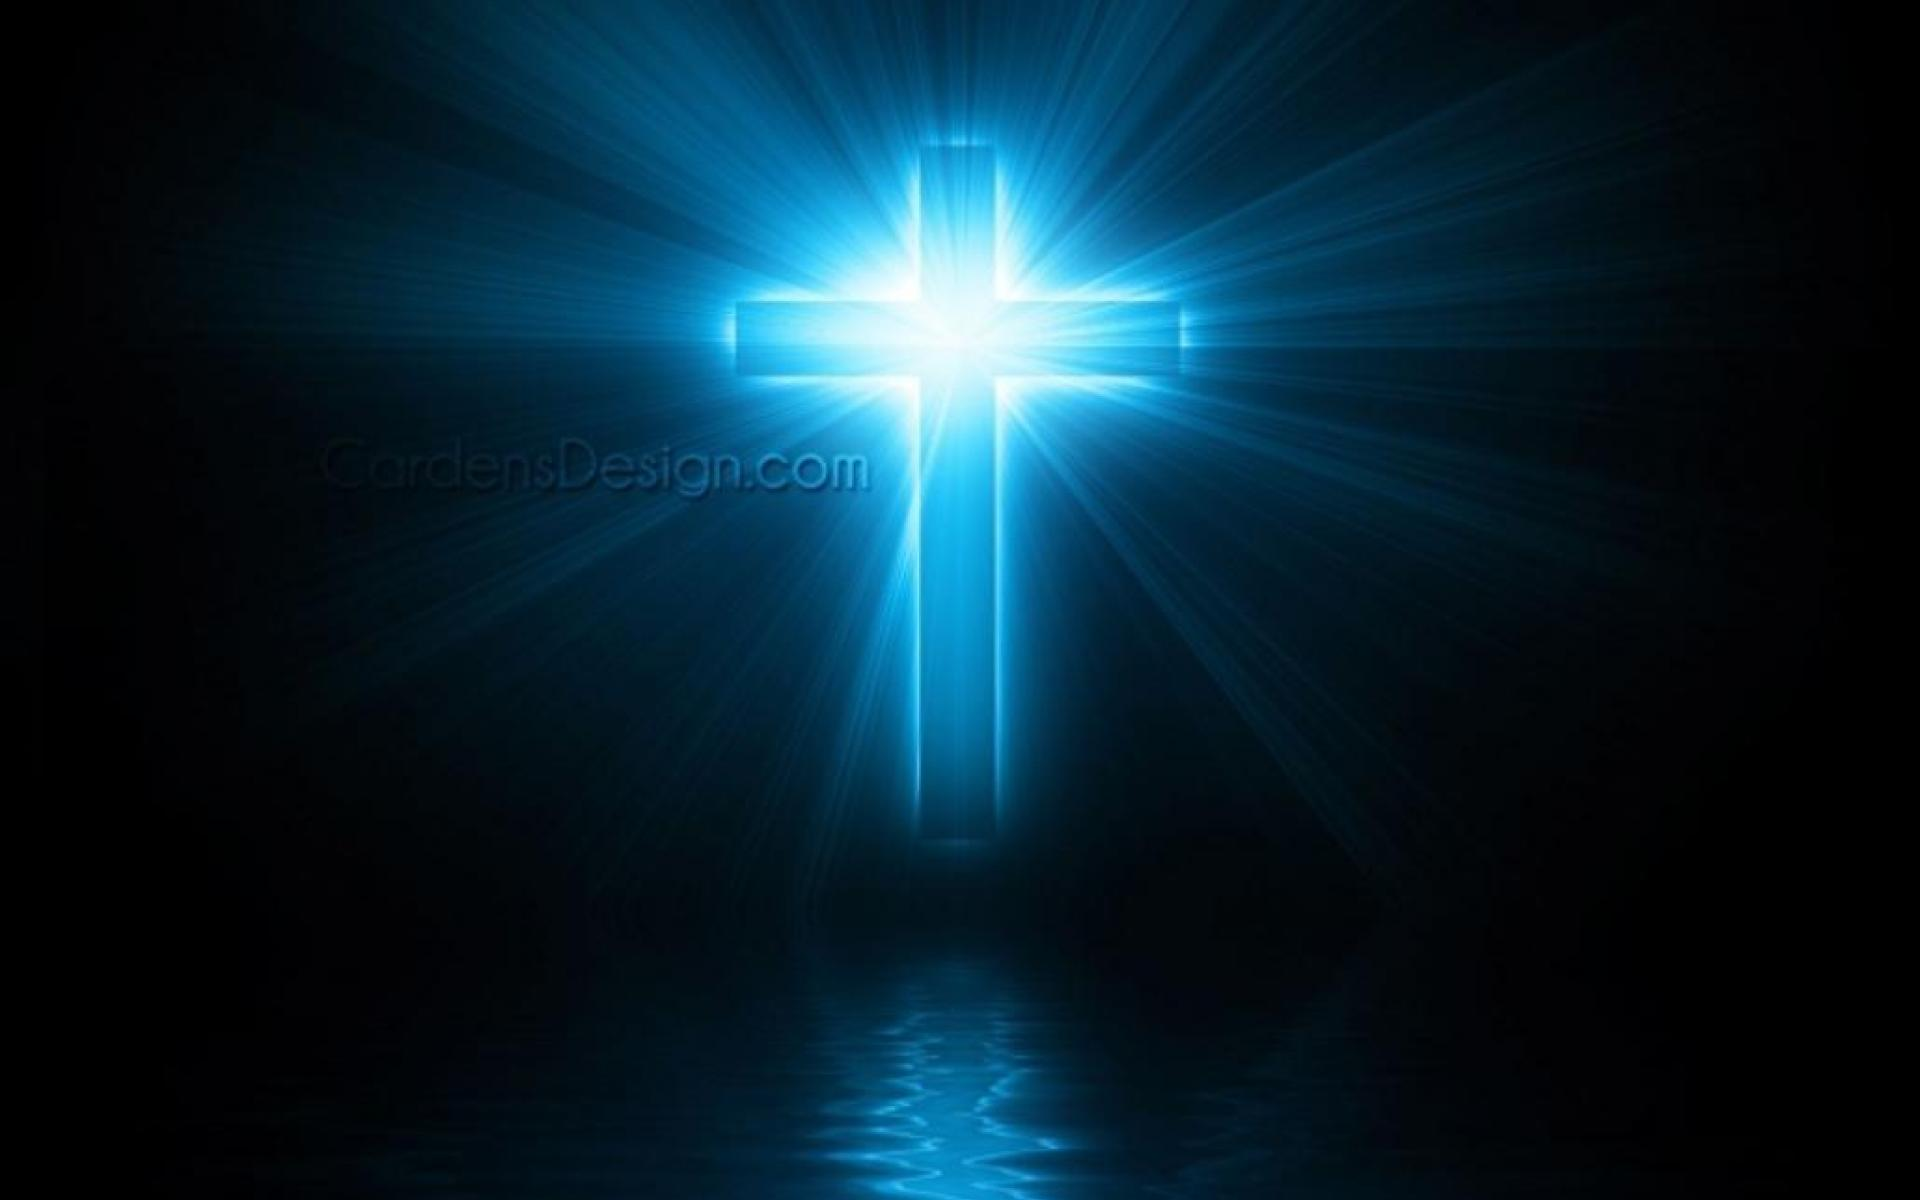 crucifix wallpaper desktop - photo #42